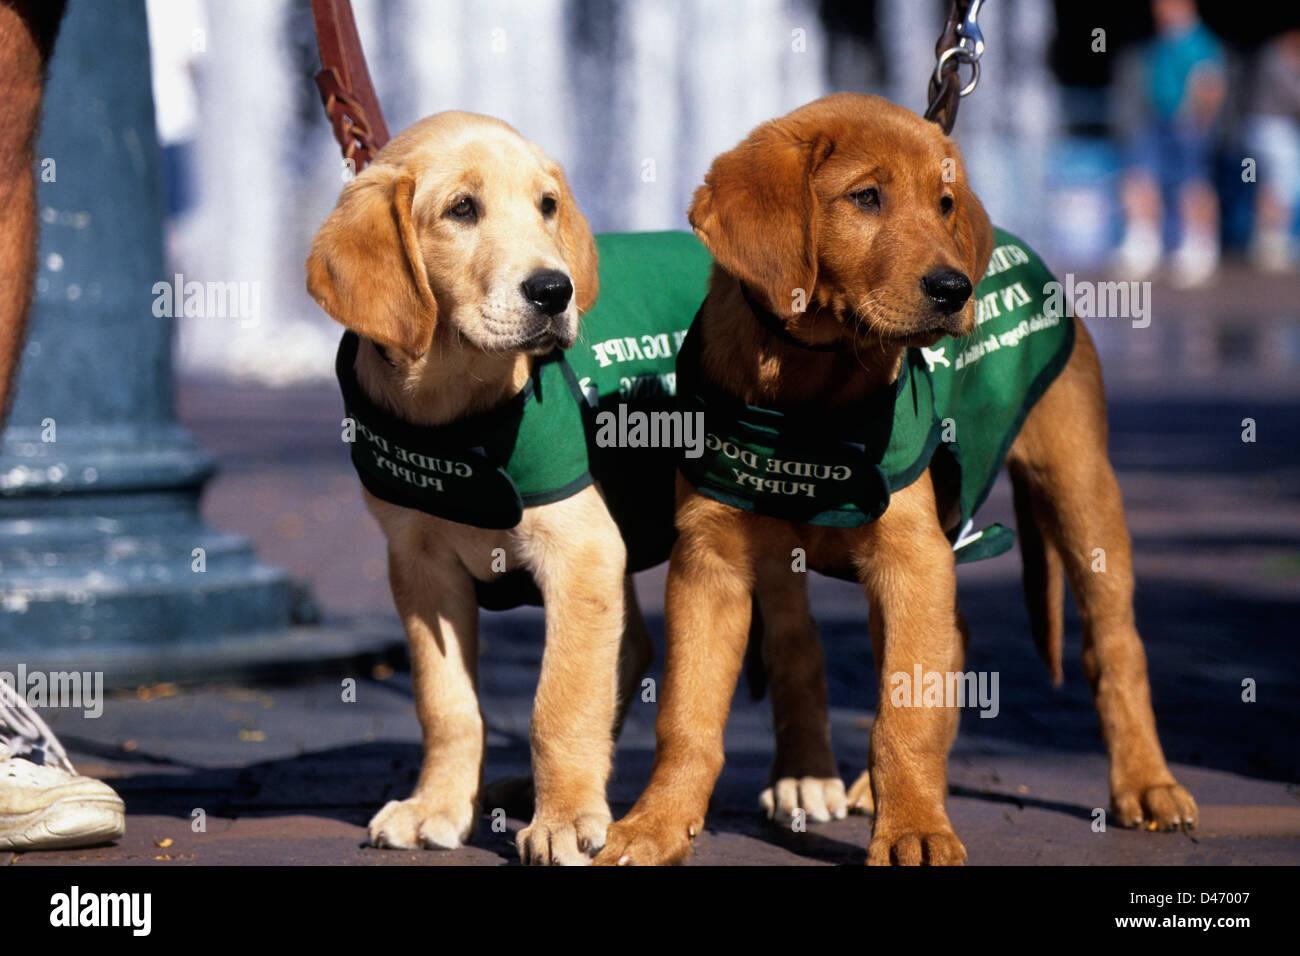 Guide Dog Training Stock Photos & Guide Dog Training Stock Images